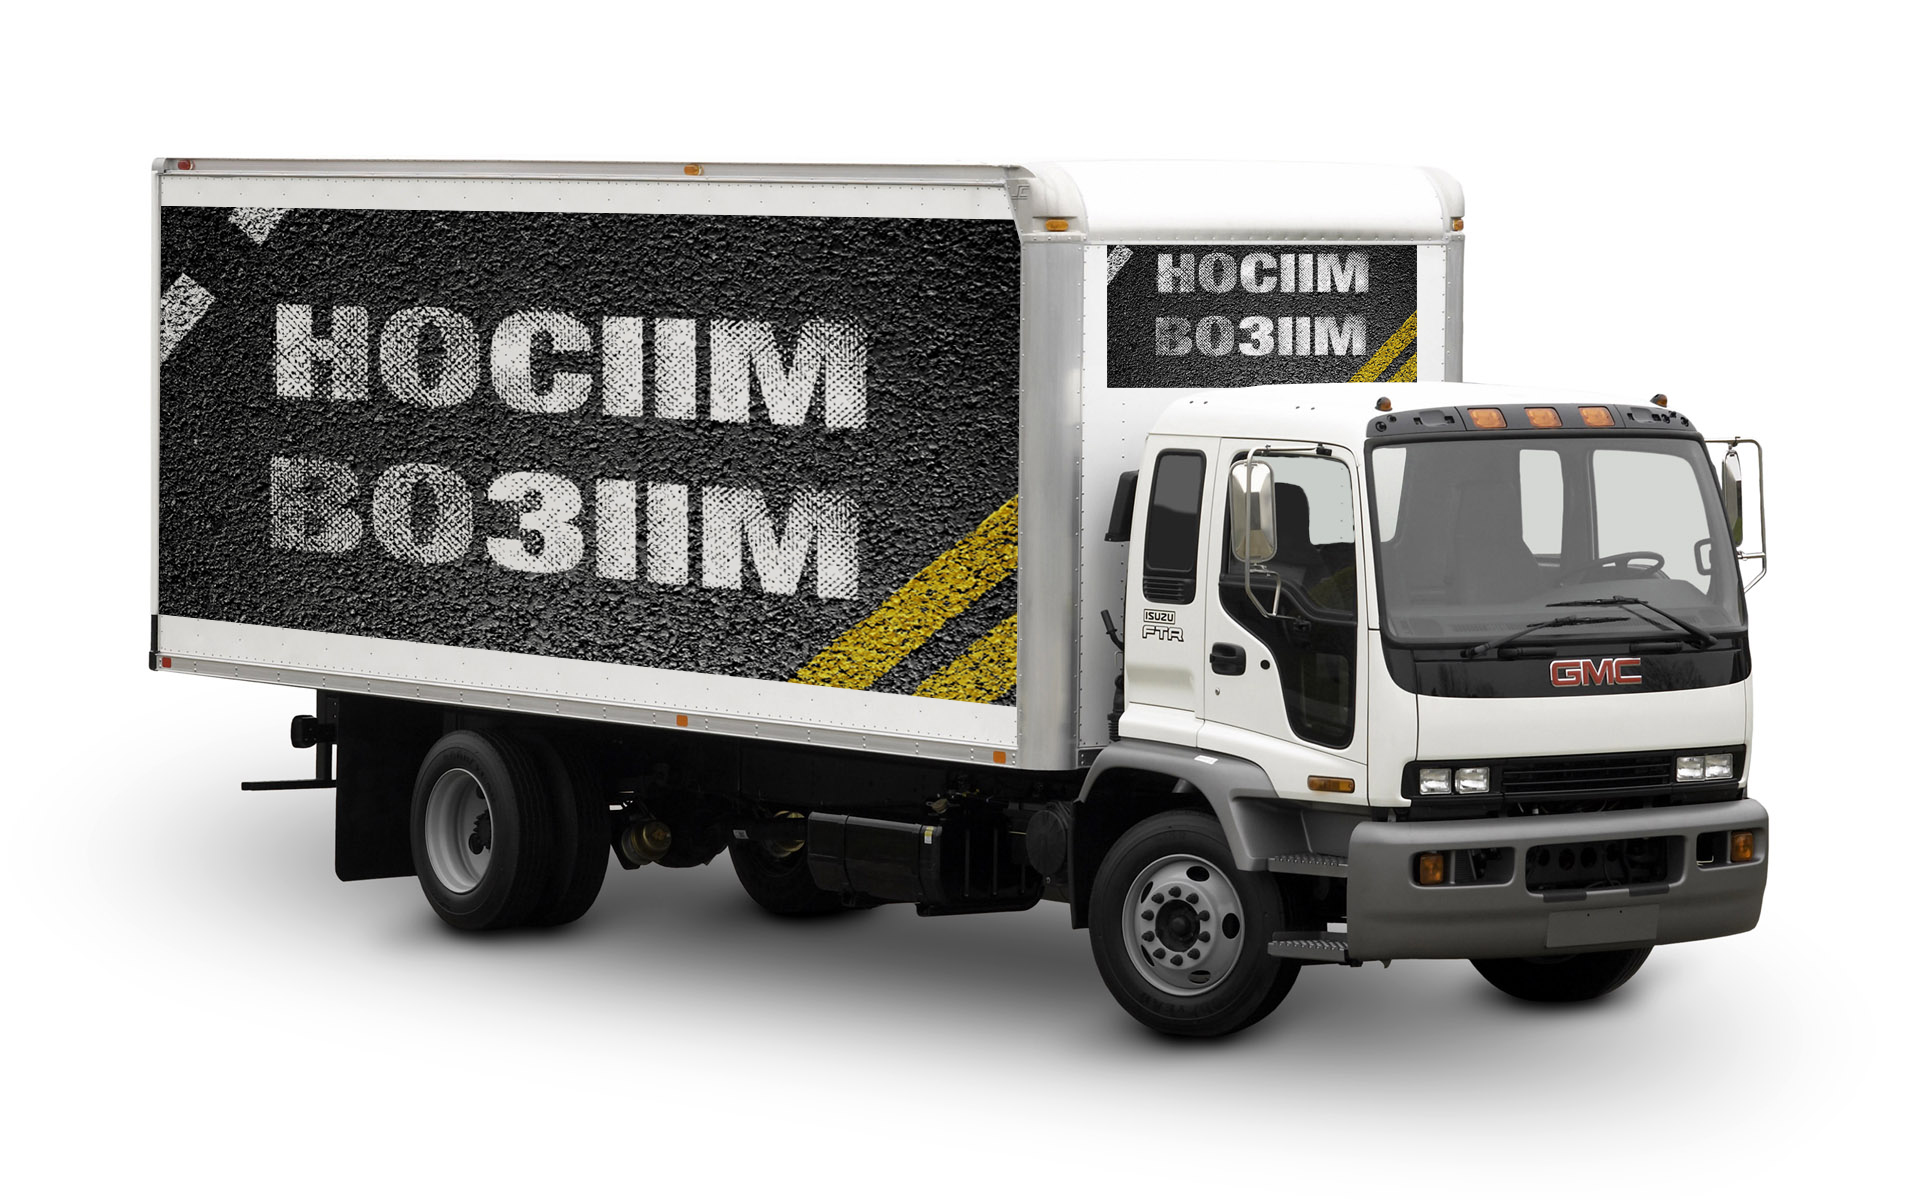 Логотип компании по перевозкам НосимВозим фото f_4625cf66daca94a5.jpg